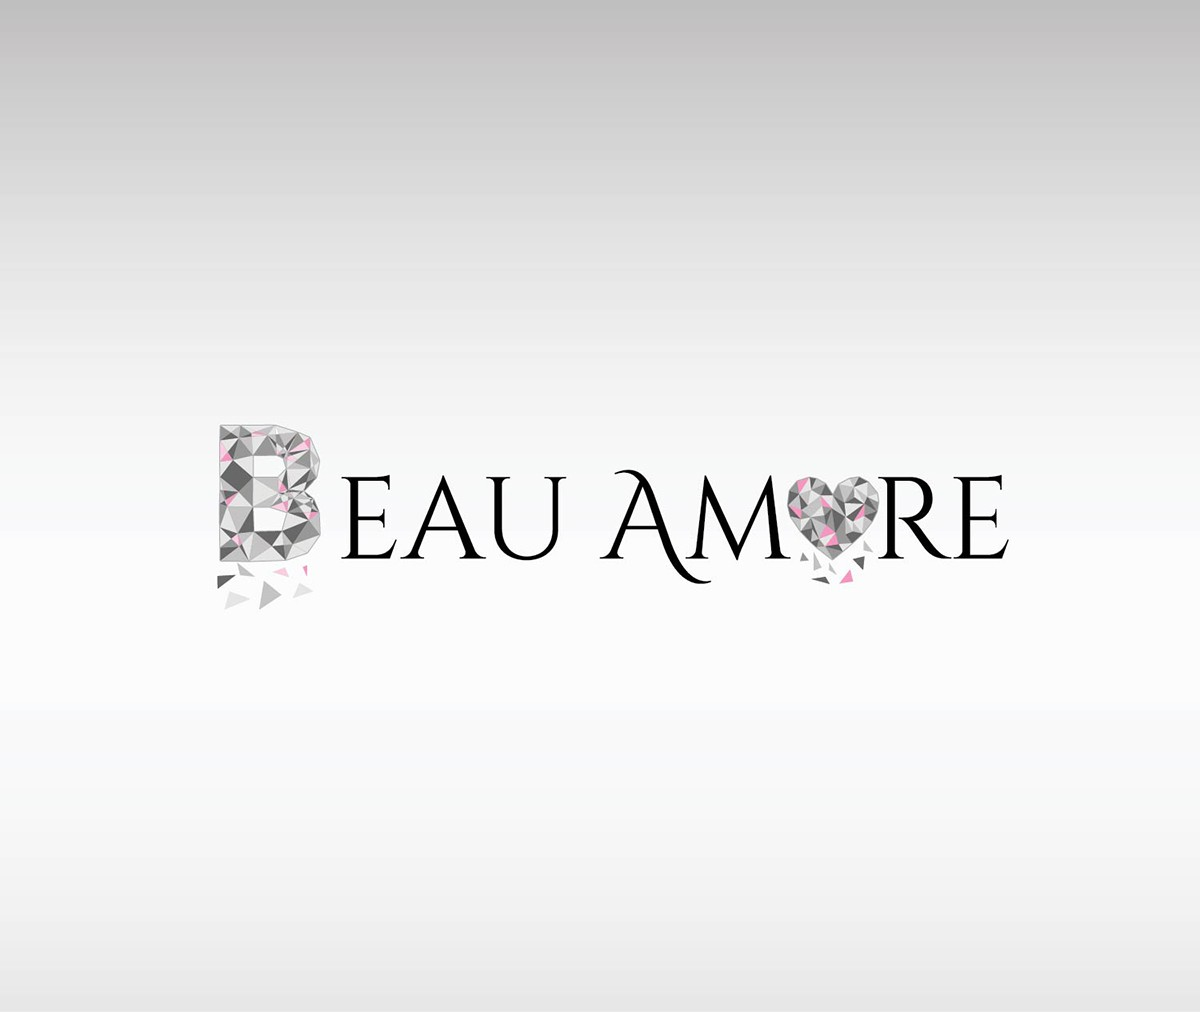 Create a logo for a new fashion jewellery website